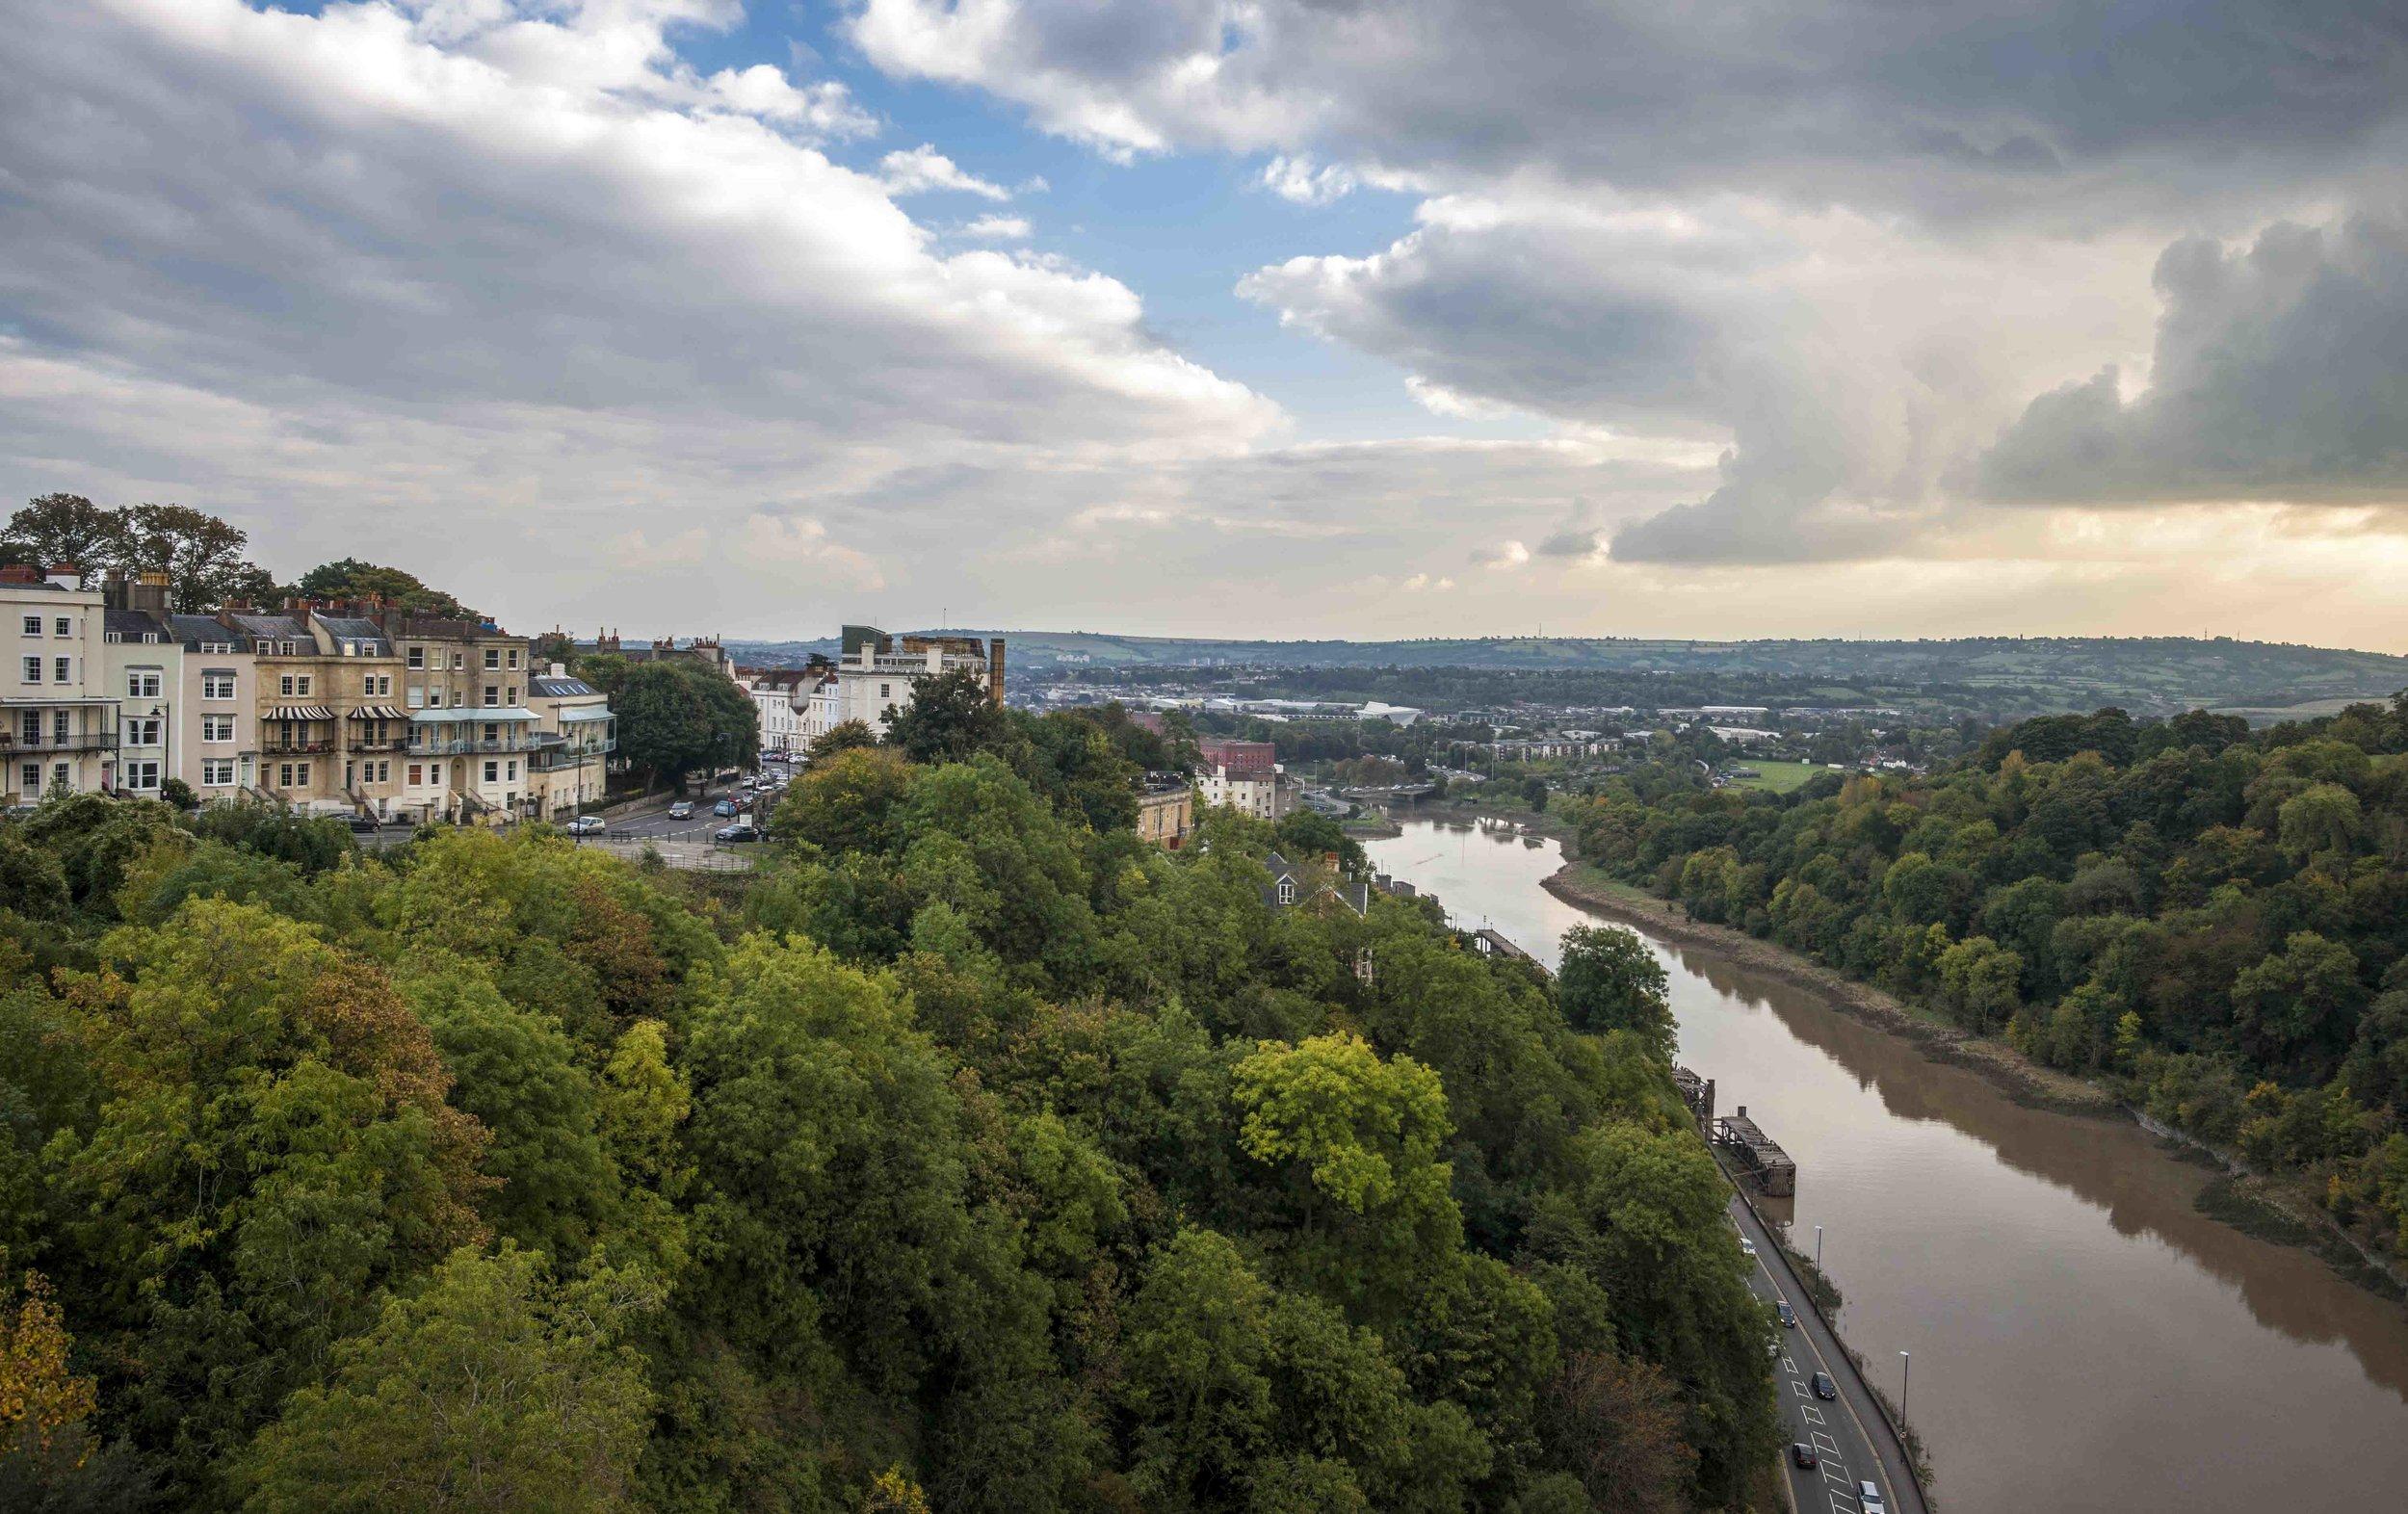 River Avon, Bristol